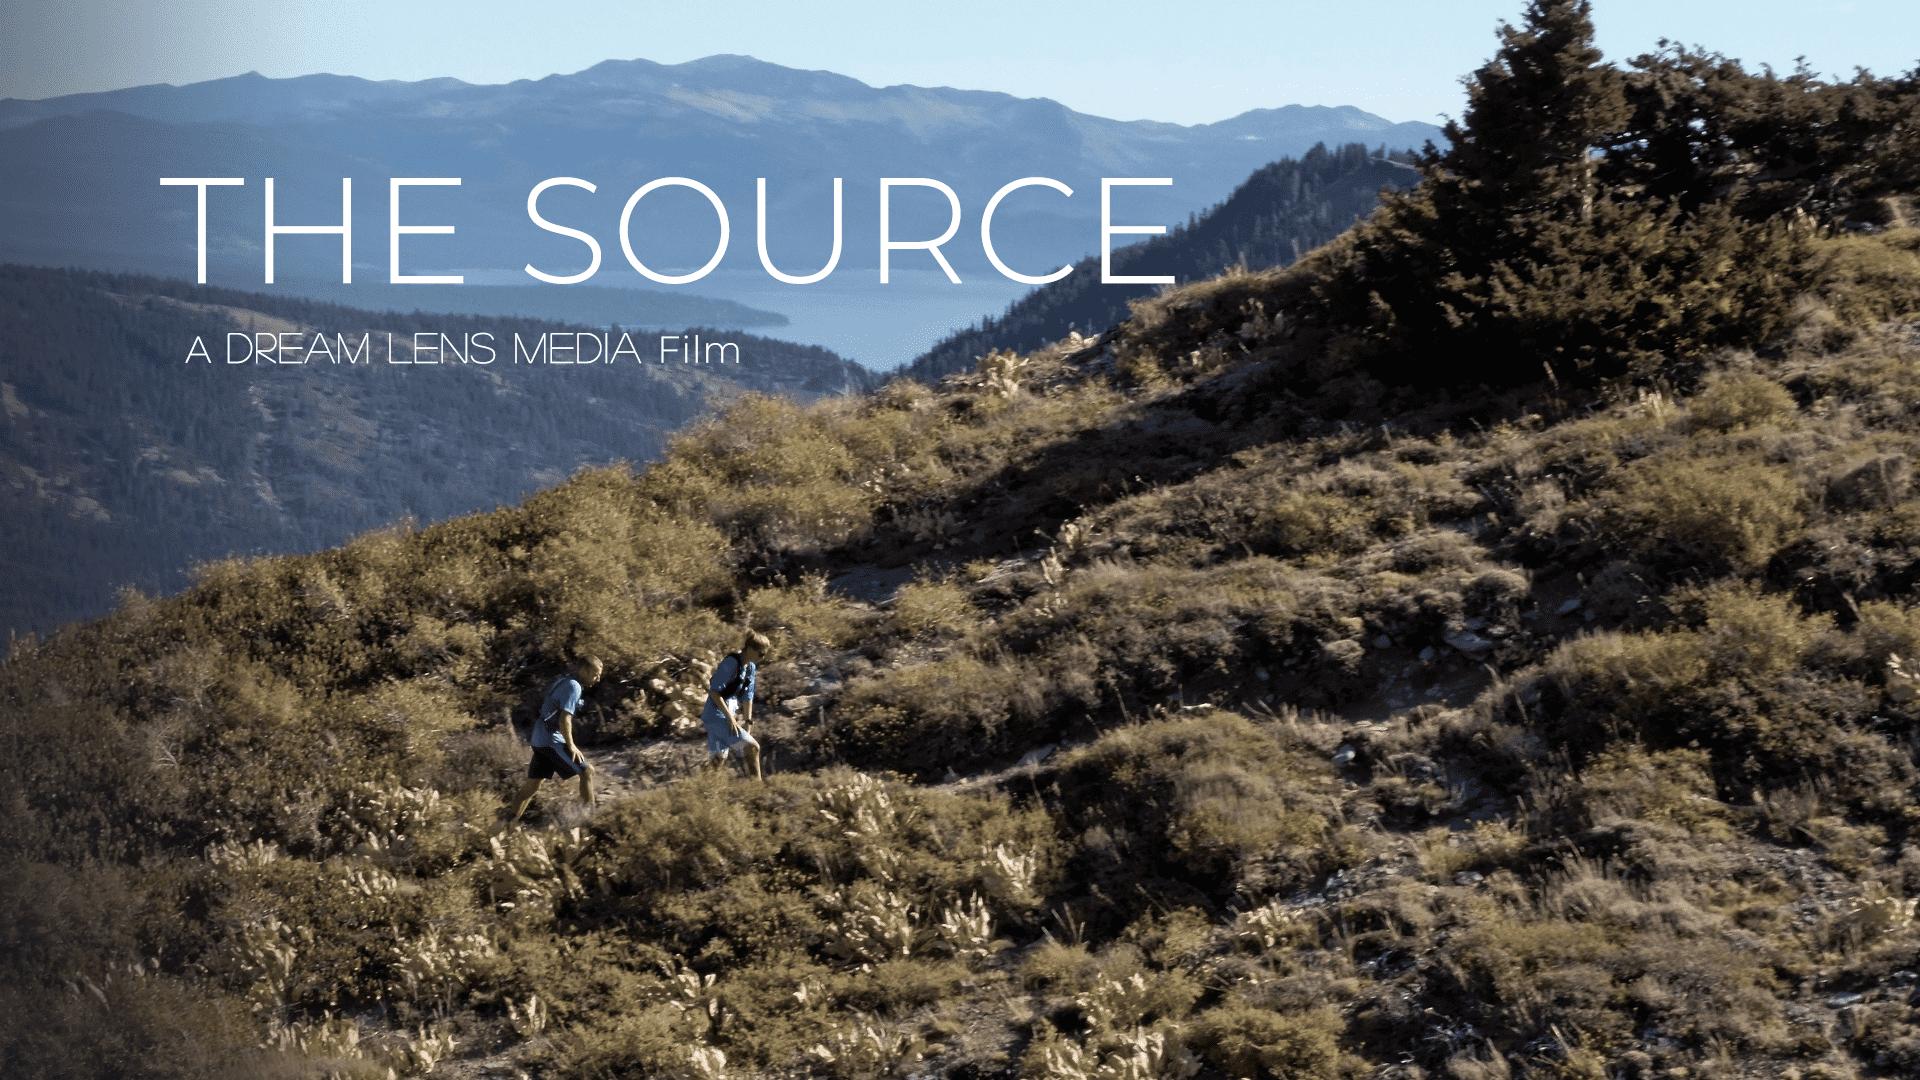 Courtney Dauwalter: The Source